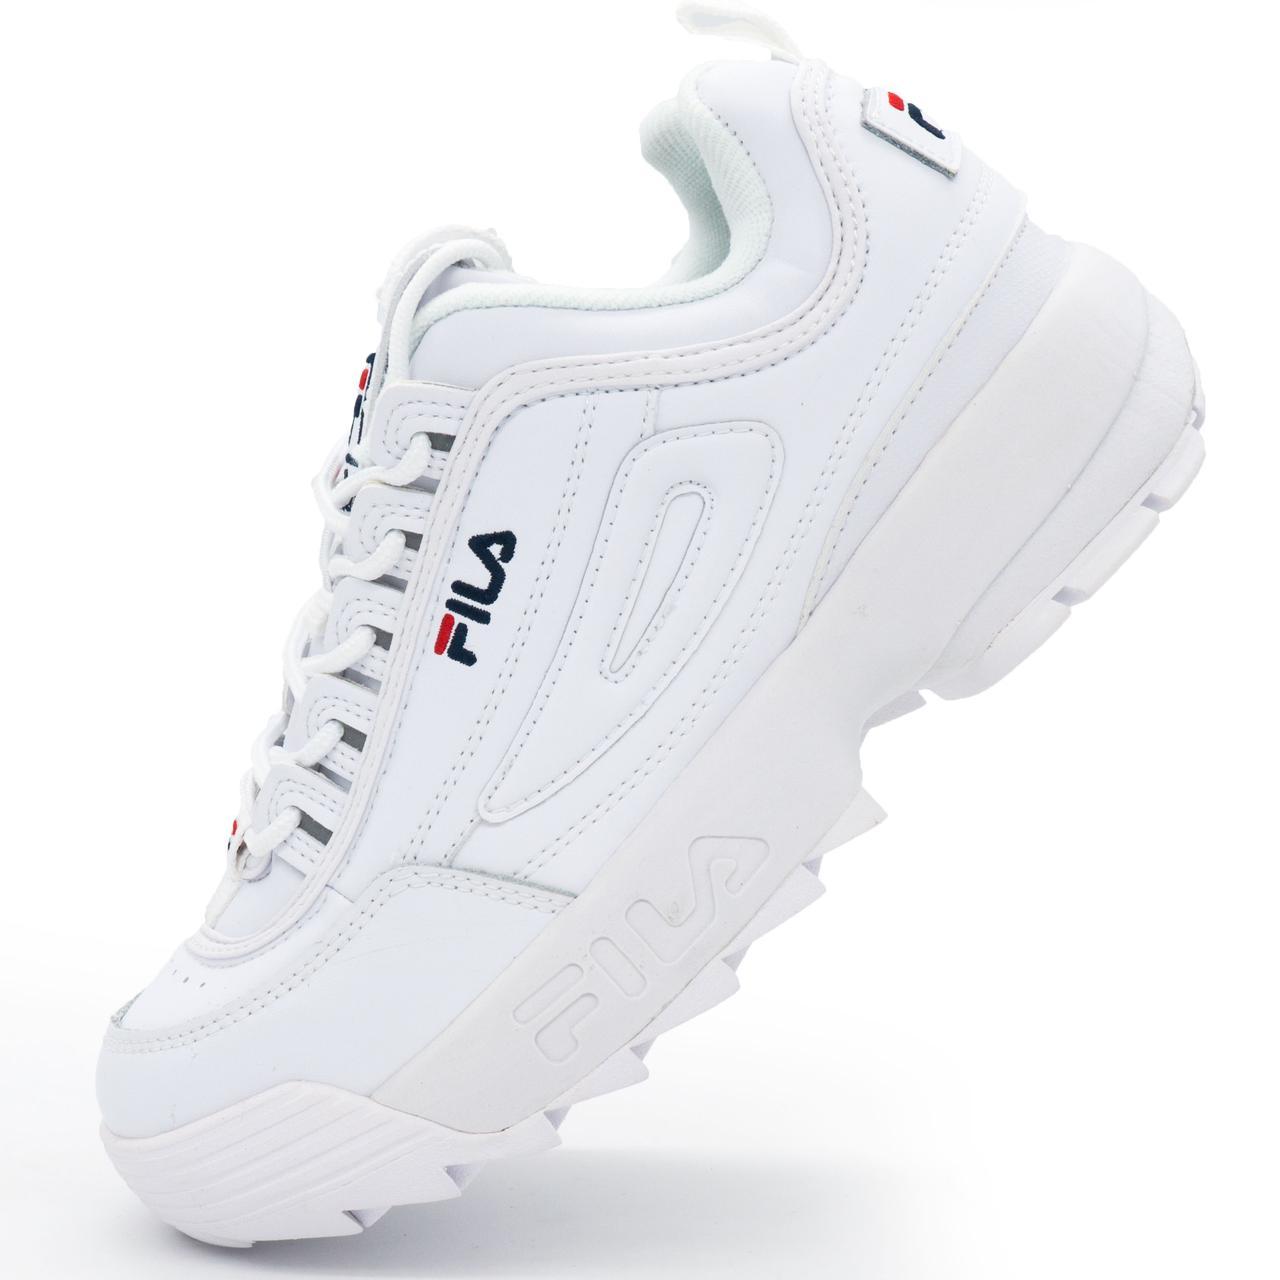 295d72ae5bc4 Белые кроссовки FILA Disruptor 2. Топ качество! р.(36, 37, 38, 39, 40, 41,  42, 43, 44.5)